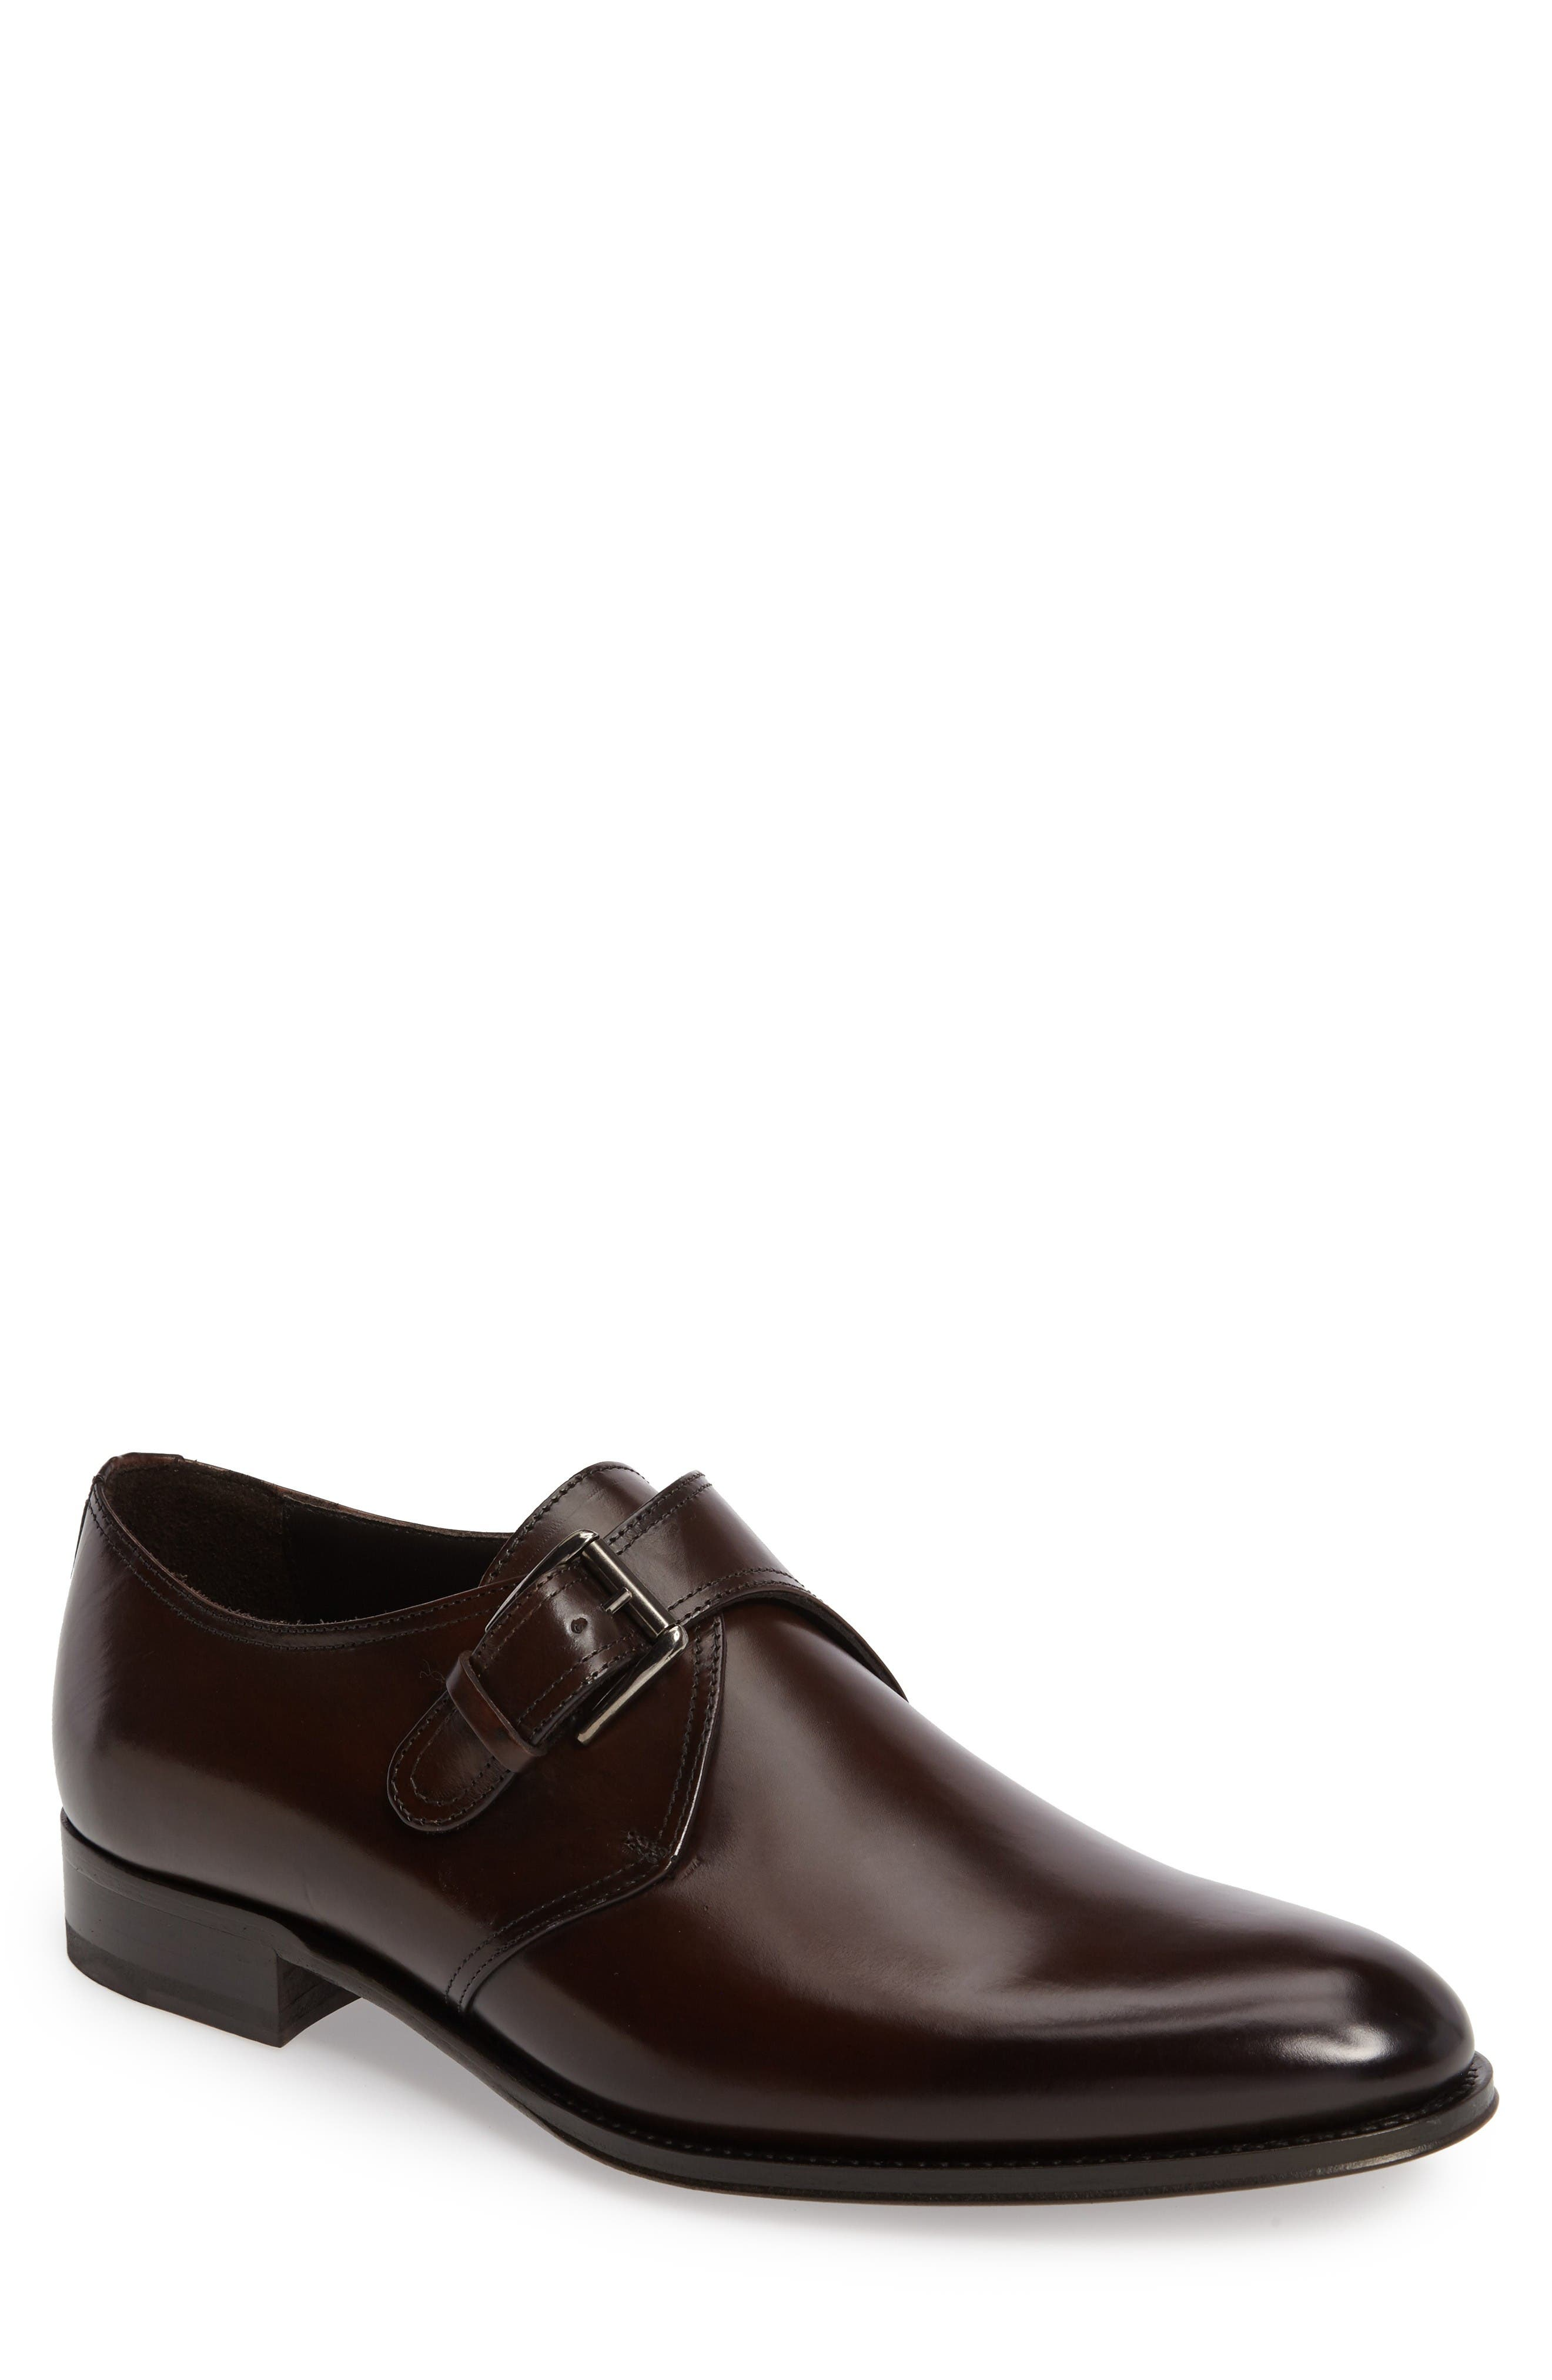 Emmett Monk Strap Shoe,                             Main thumbnail 1, color,                             Maroon Leather